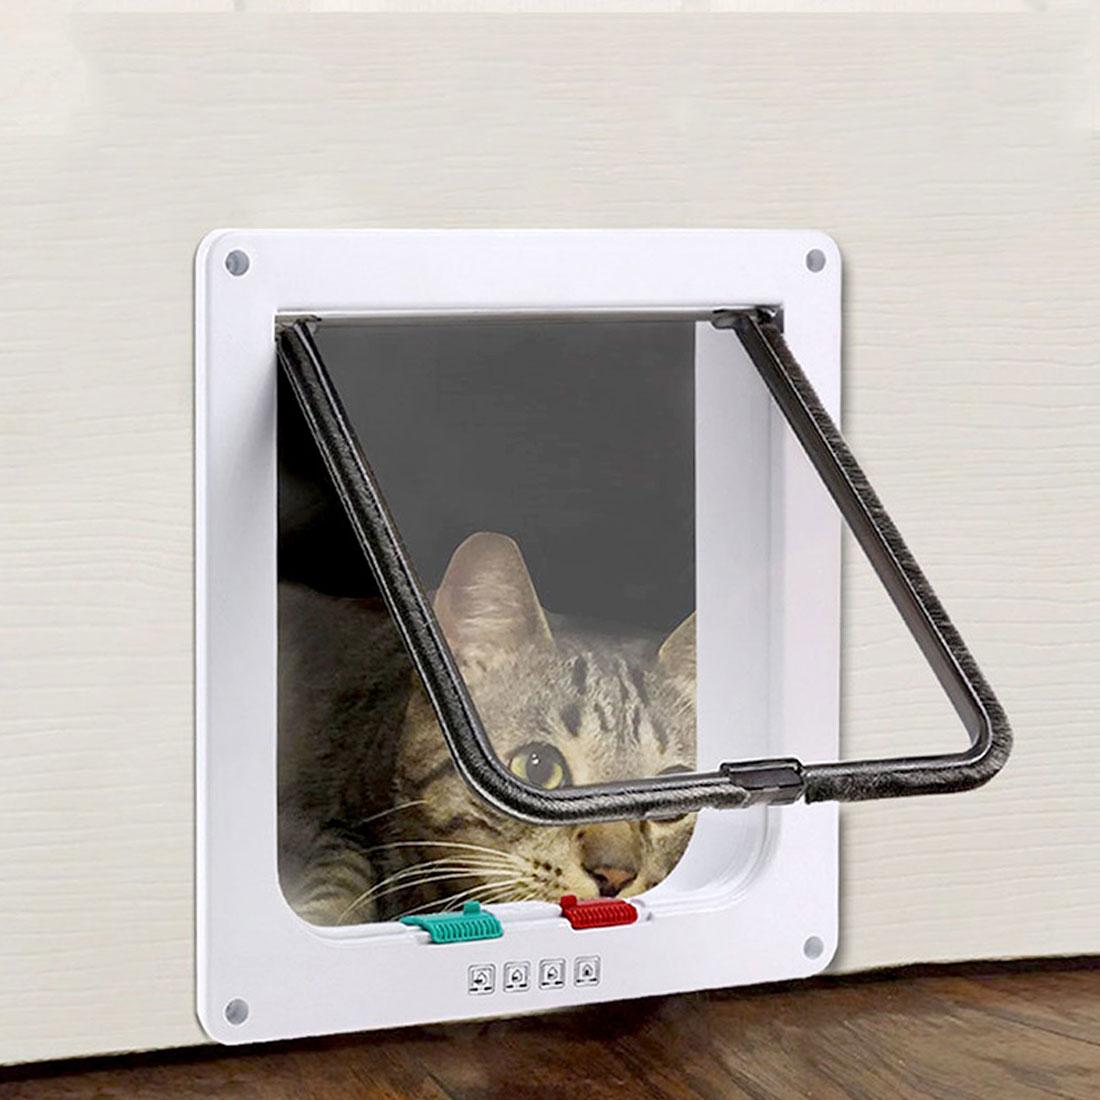 4 way lockable gato cão pet à prova dwaterproof água abs plástico exclusivo aleta porta porta gato porta aleta de alta qualidade